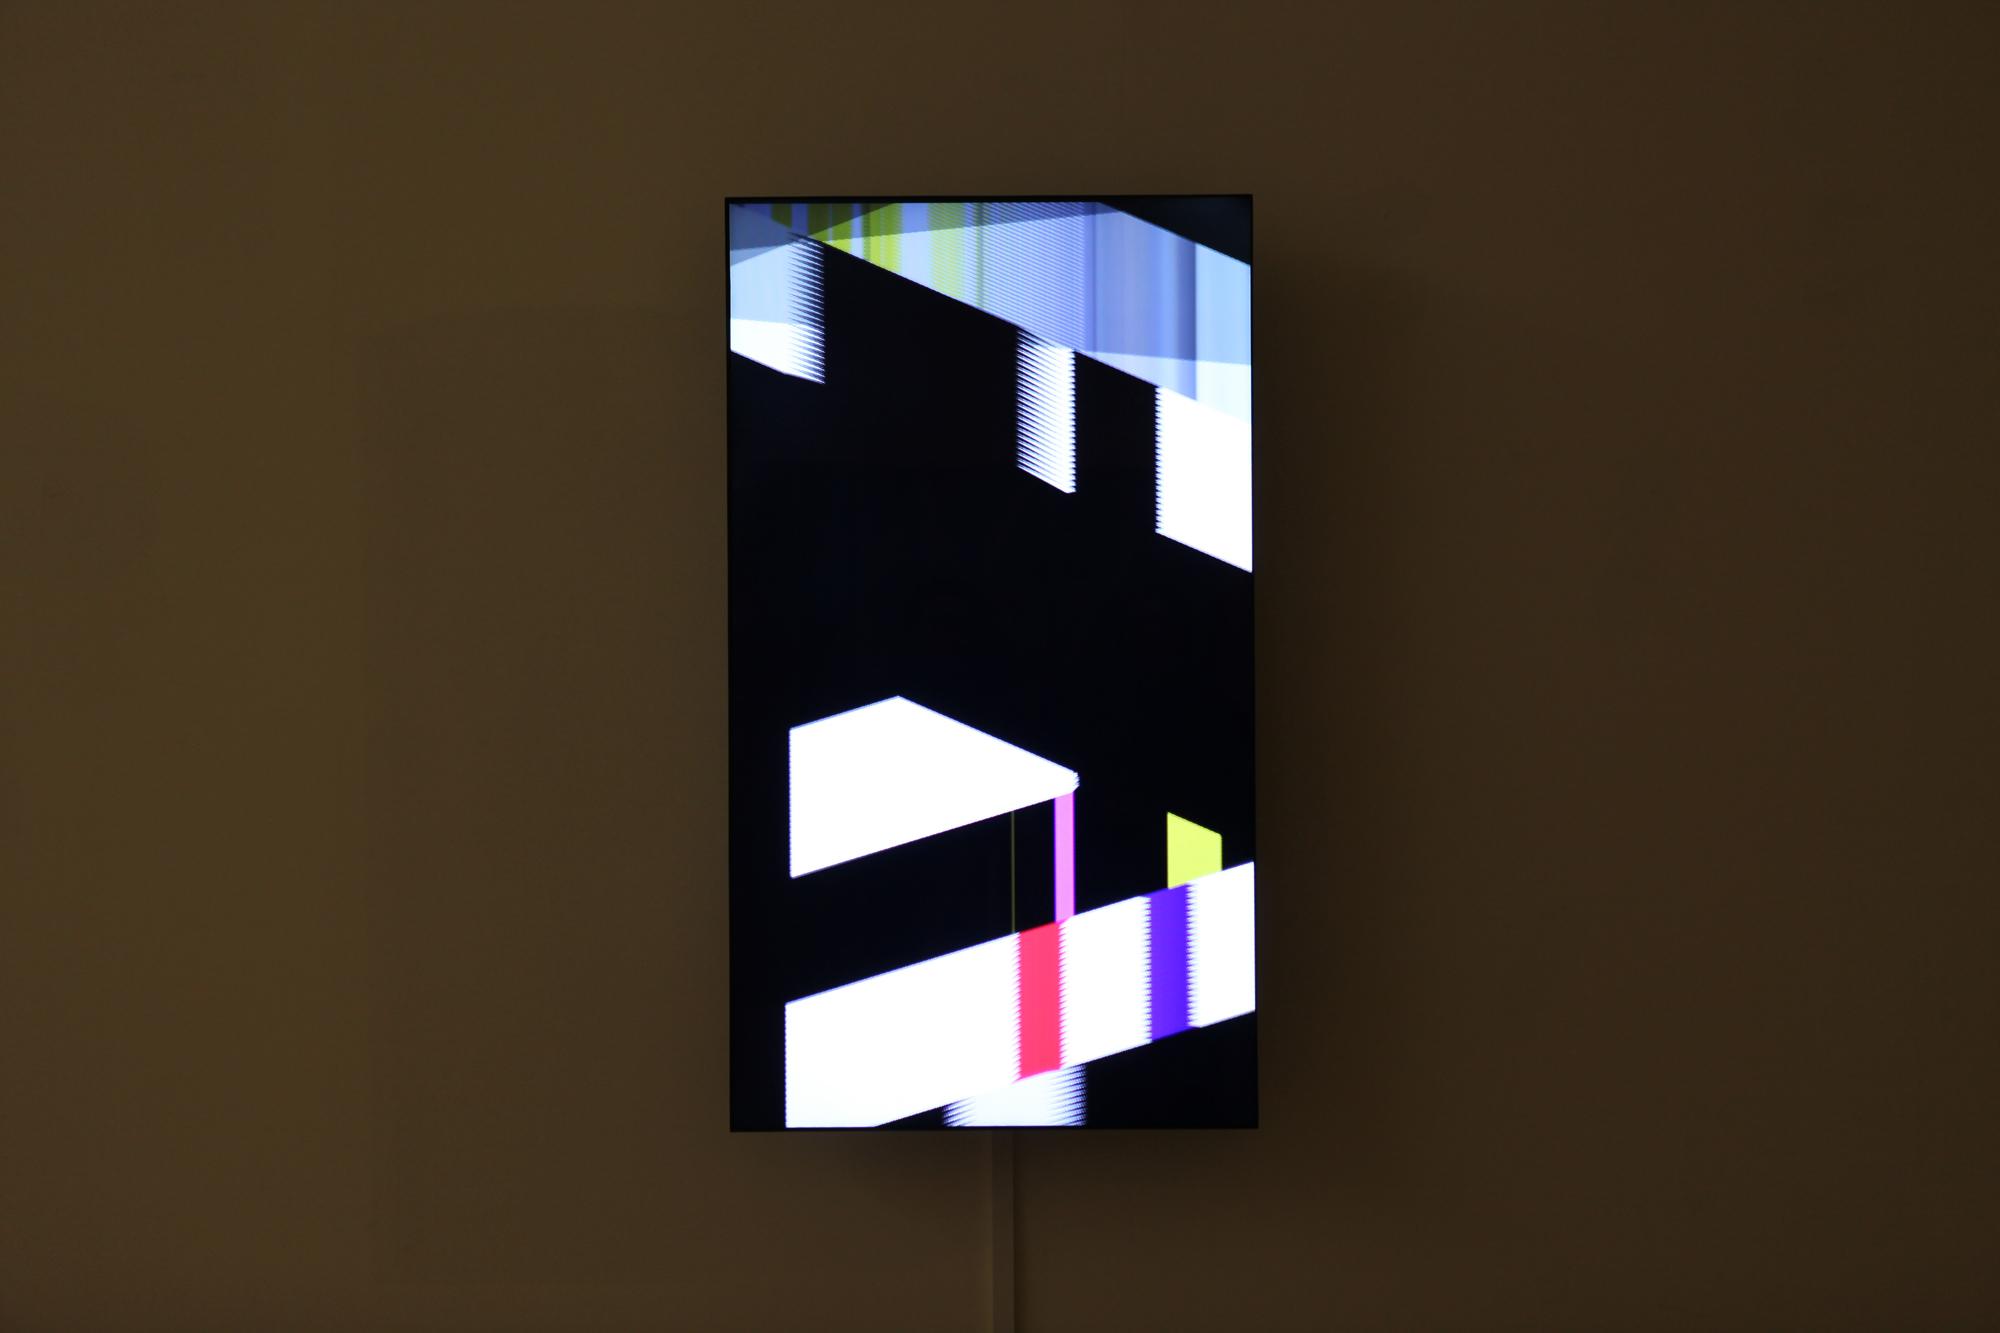 "Taeyoon Kim, Sophisticatedfunk, custom software, 47"" monitor, 2012"